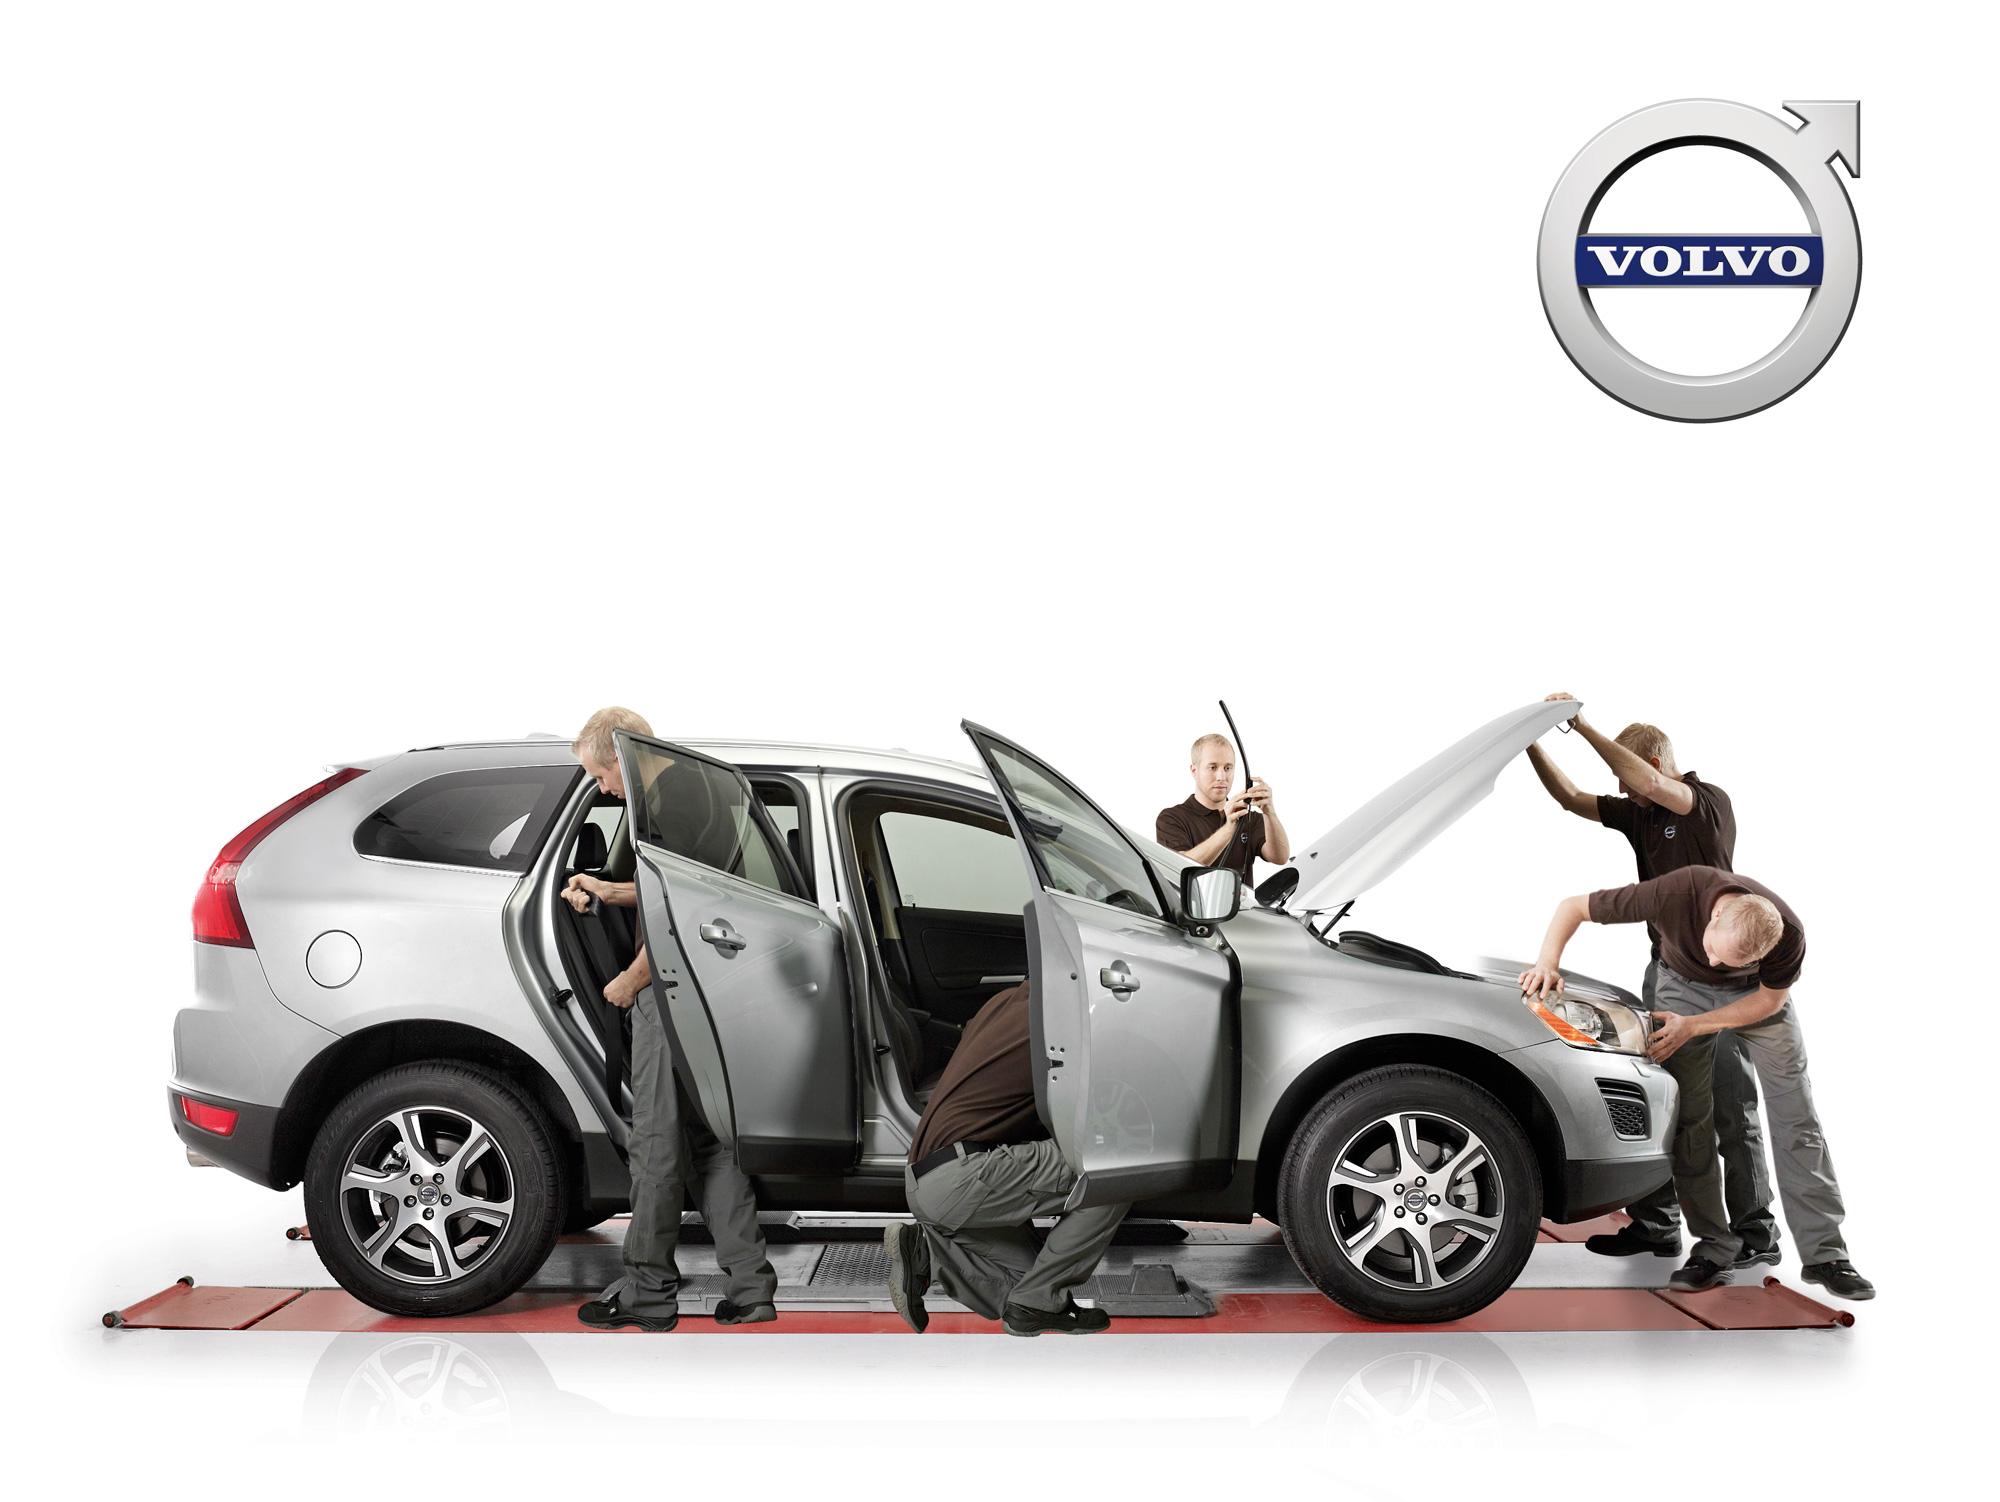 Valtuutettu Volvo-huolto